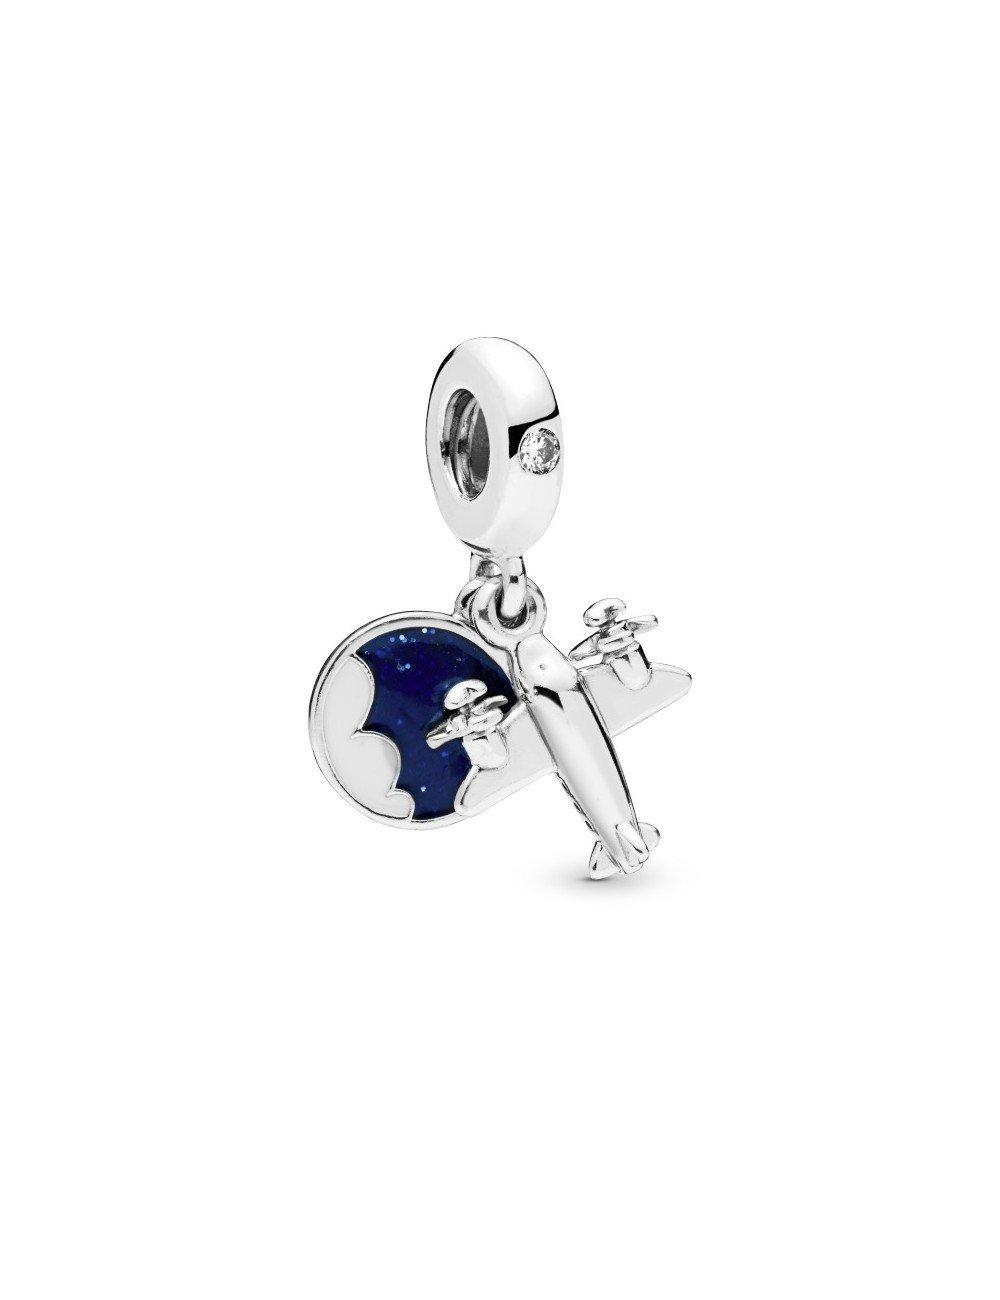 Shop Now Pandora Charm Colgante Silver Avioneta To Travel Is To Live Sam Parfums